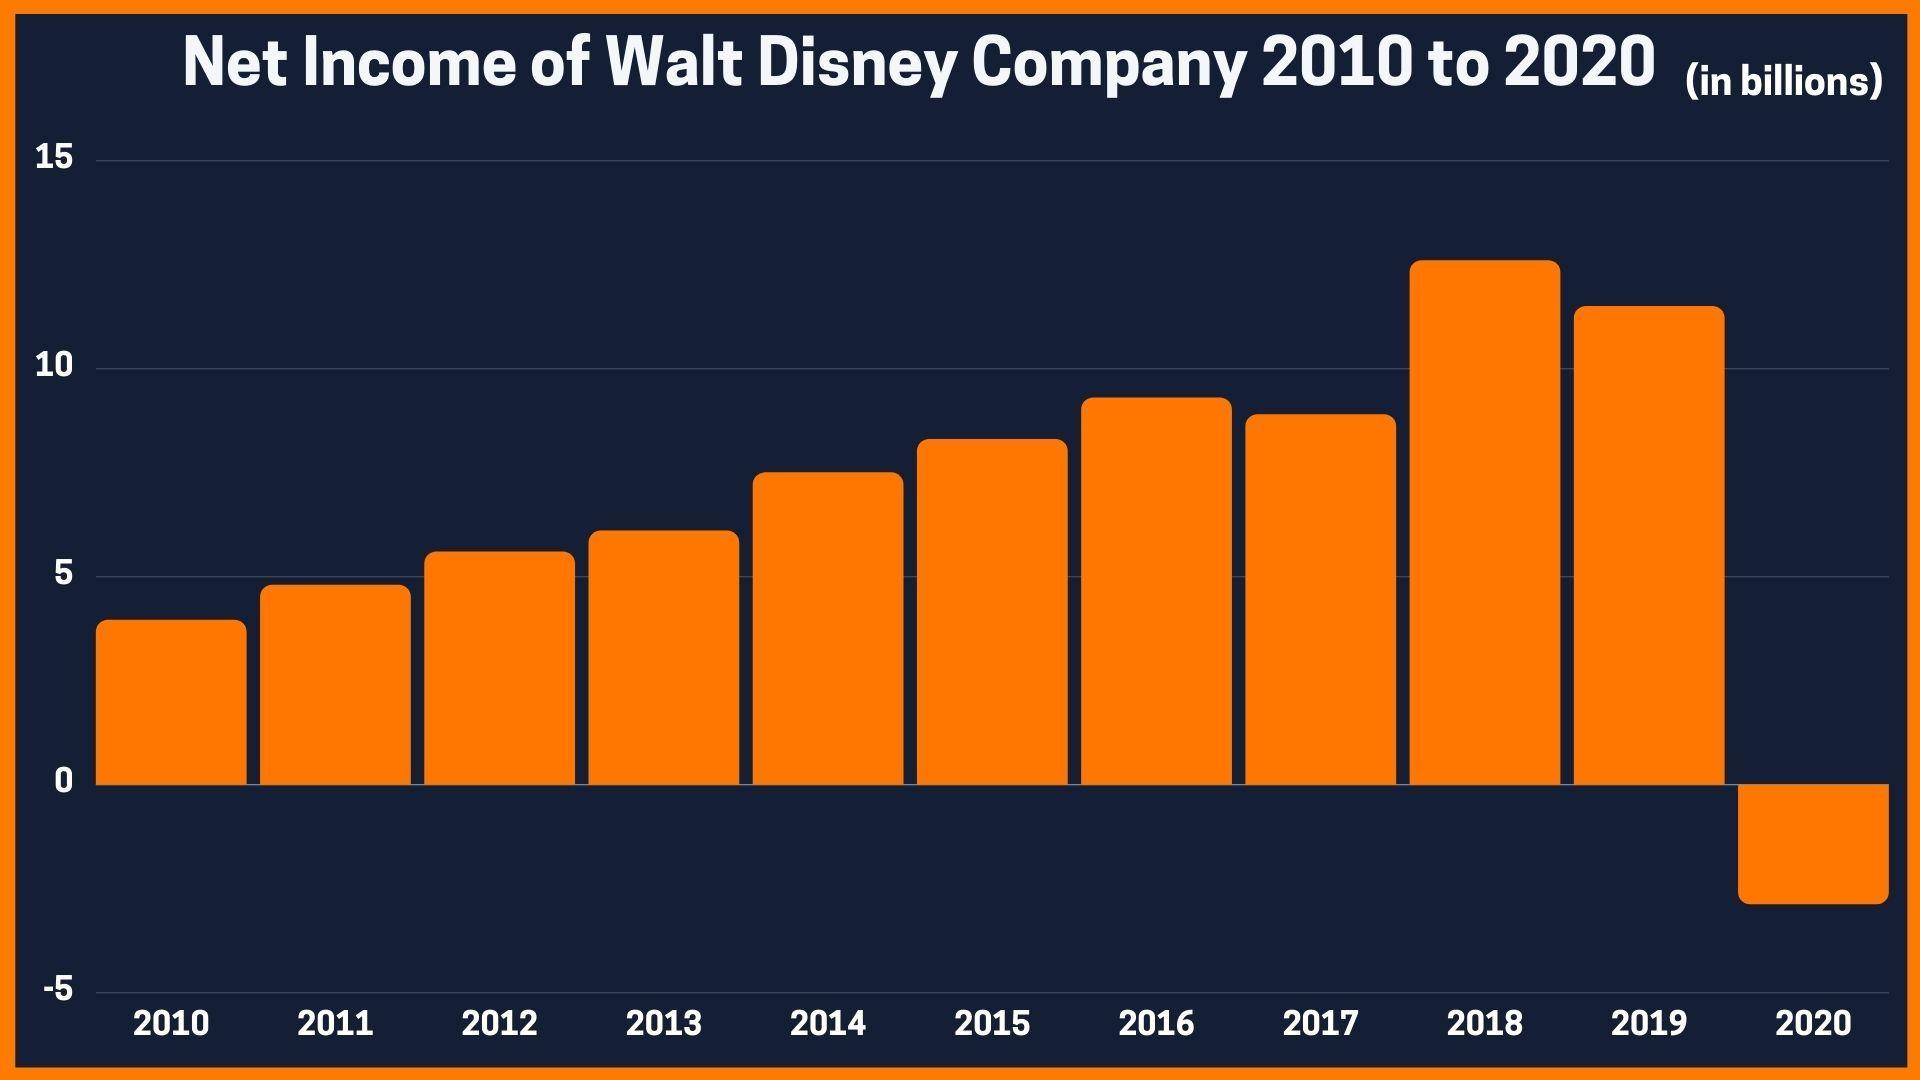 Net income of Walt Disney